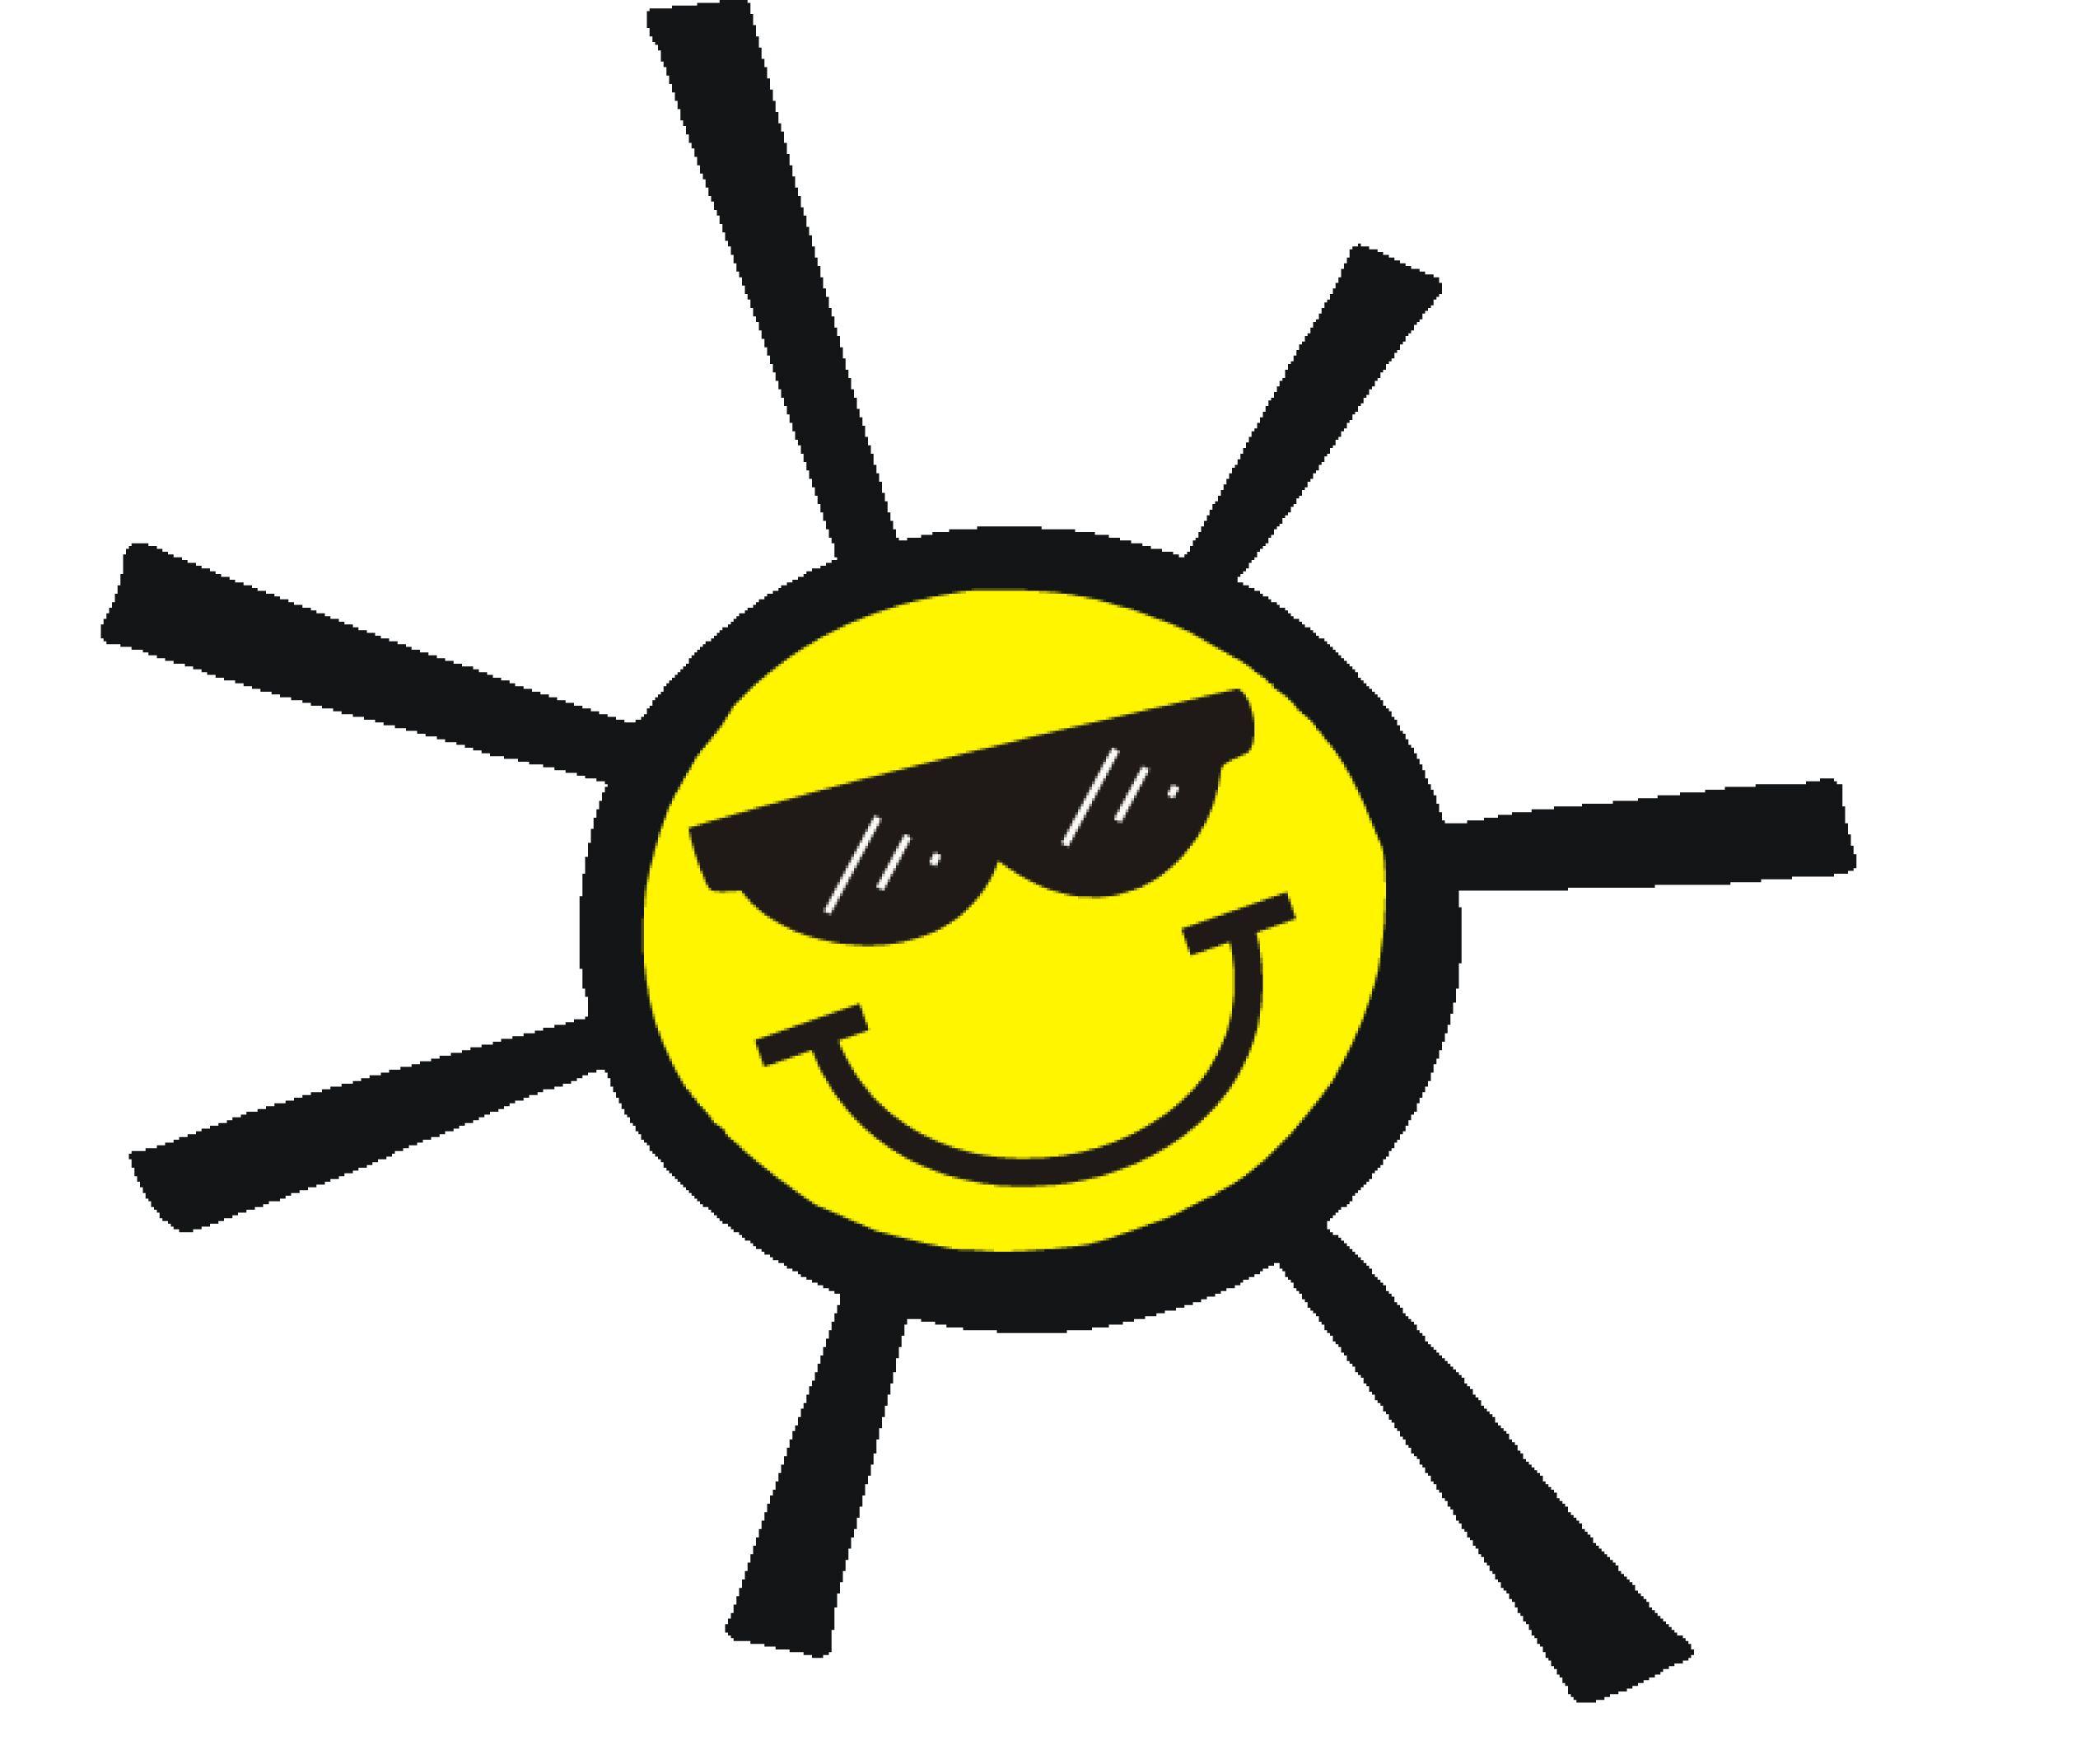 clip art summer camp summer camp clipart 2550 2119 jpg 2 550 2 119 rh pinterest com summer camp clipart png summer camp clipart black and white